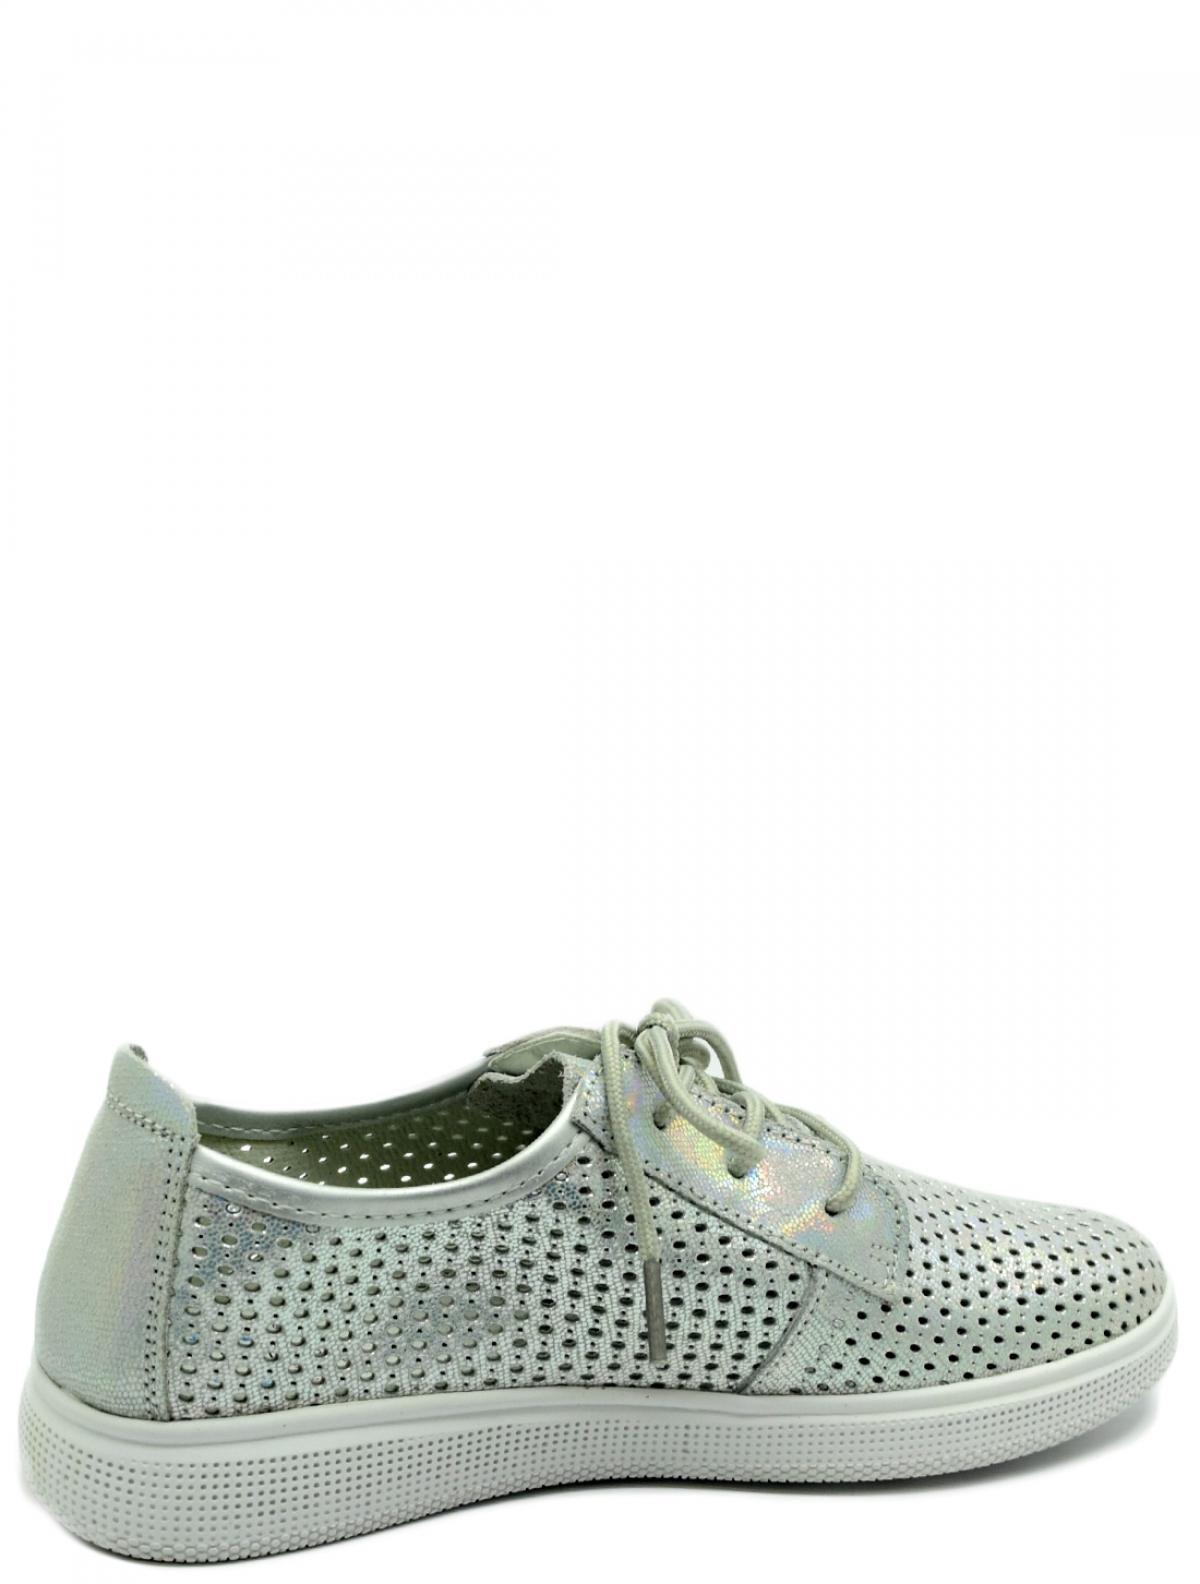 Rio Fiore 8240B-S женские кроссовки